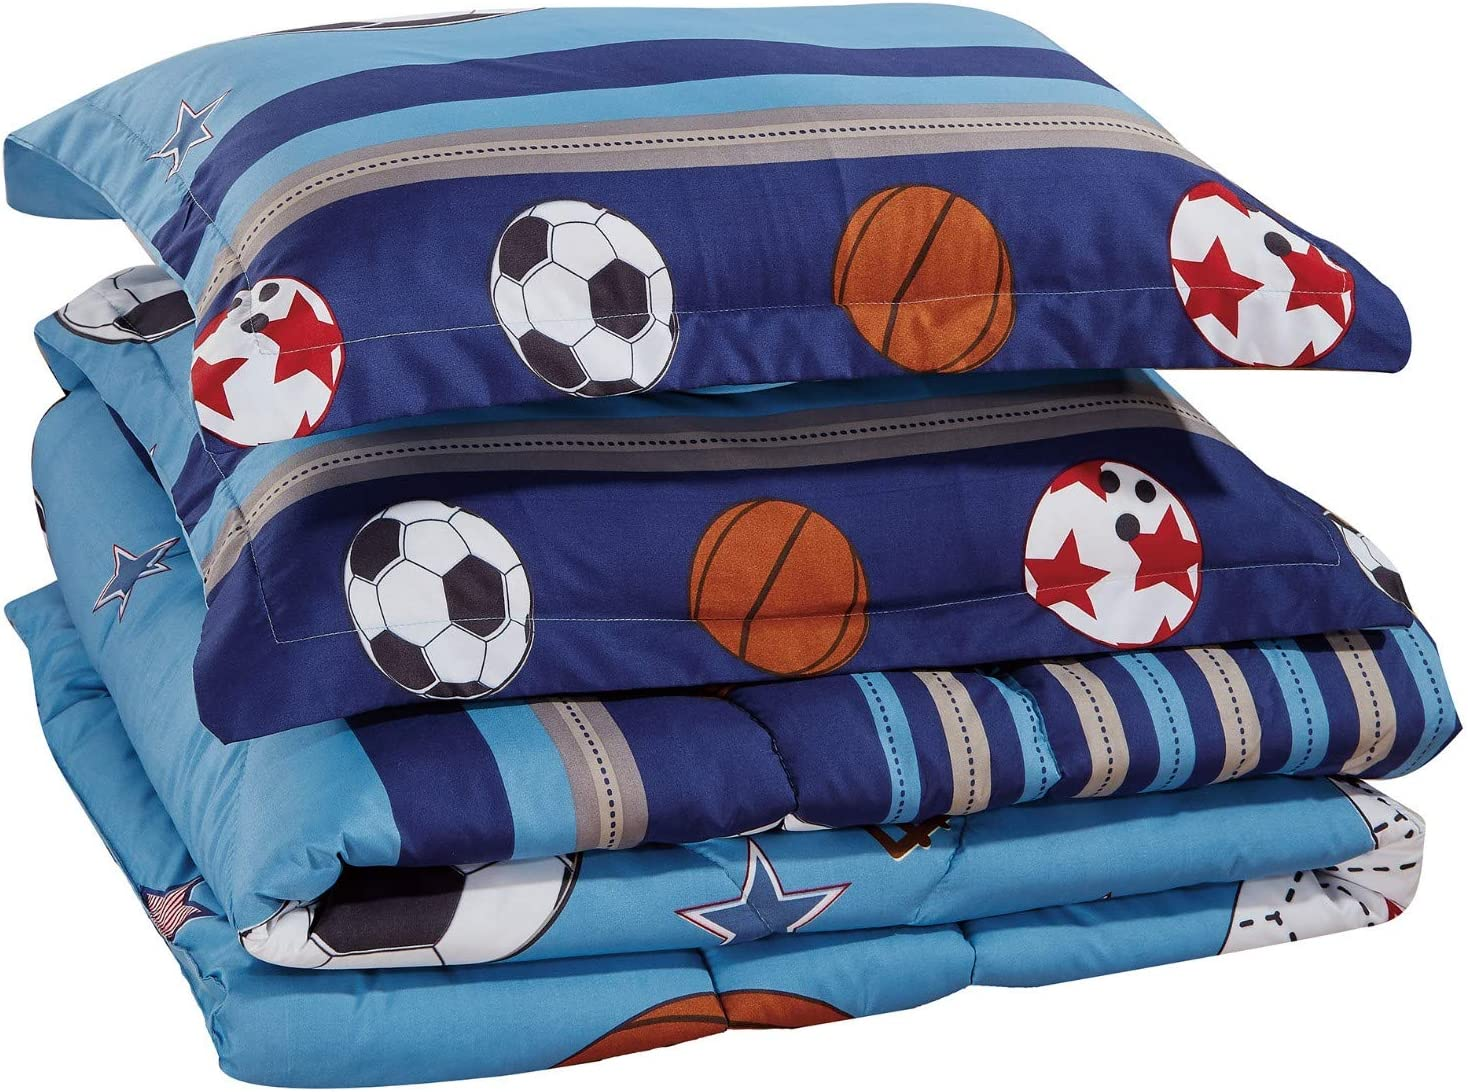 Chezmoi Collection 4-Piece Kids/Teens Sports Comforter Set - Soft Microfiber Navy Blue Black Orange Red White Basketball Football Soccer, Twin Size